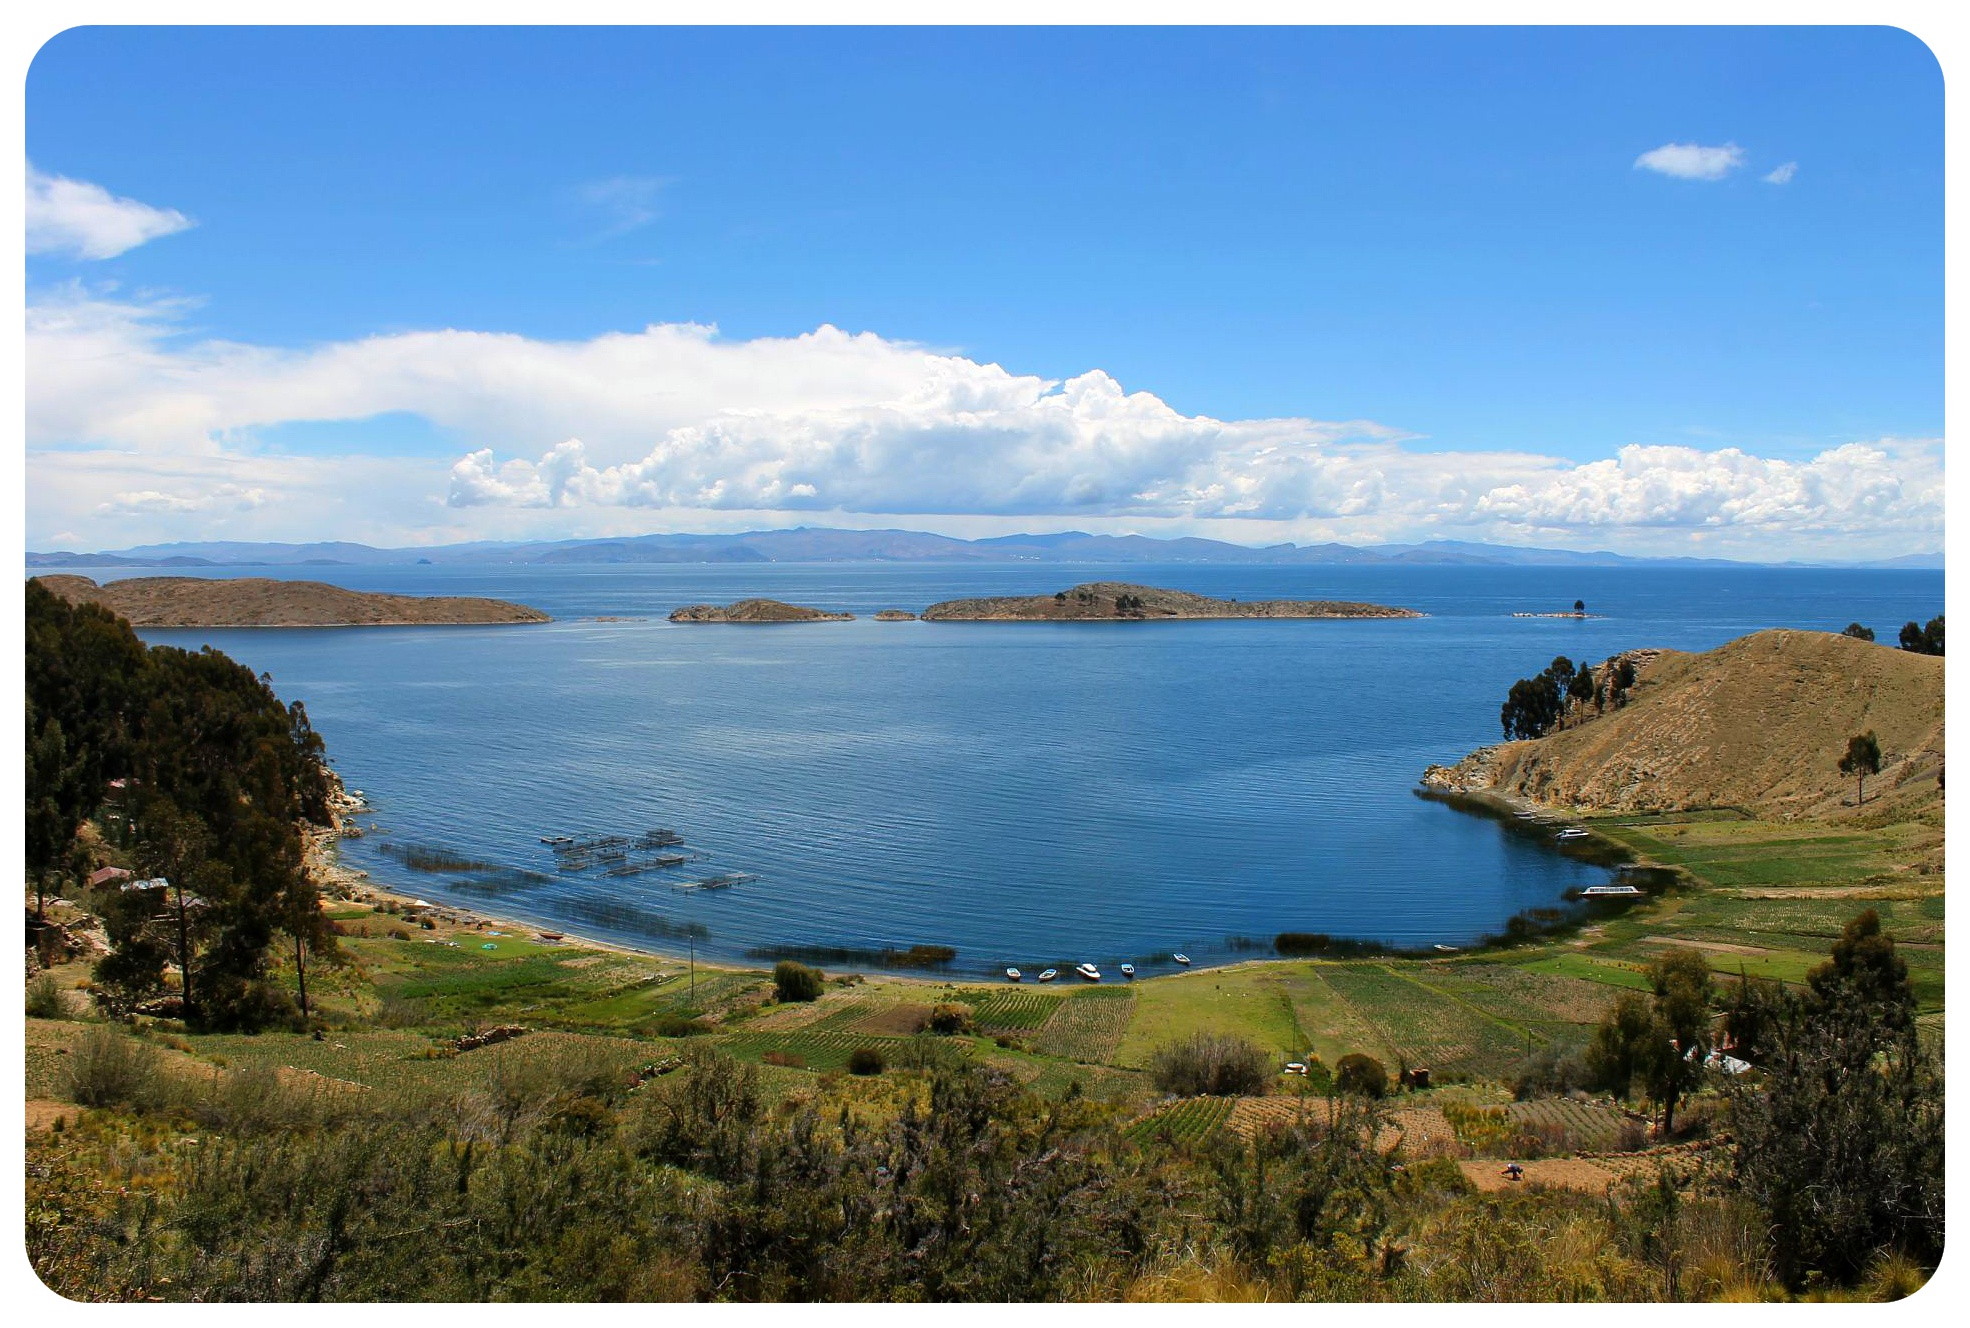 lake titicaca view